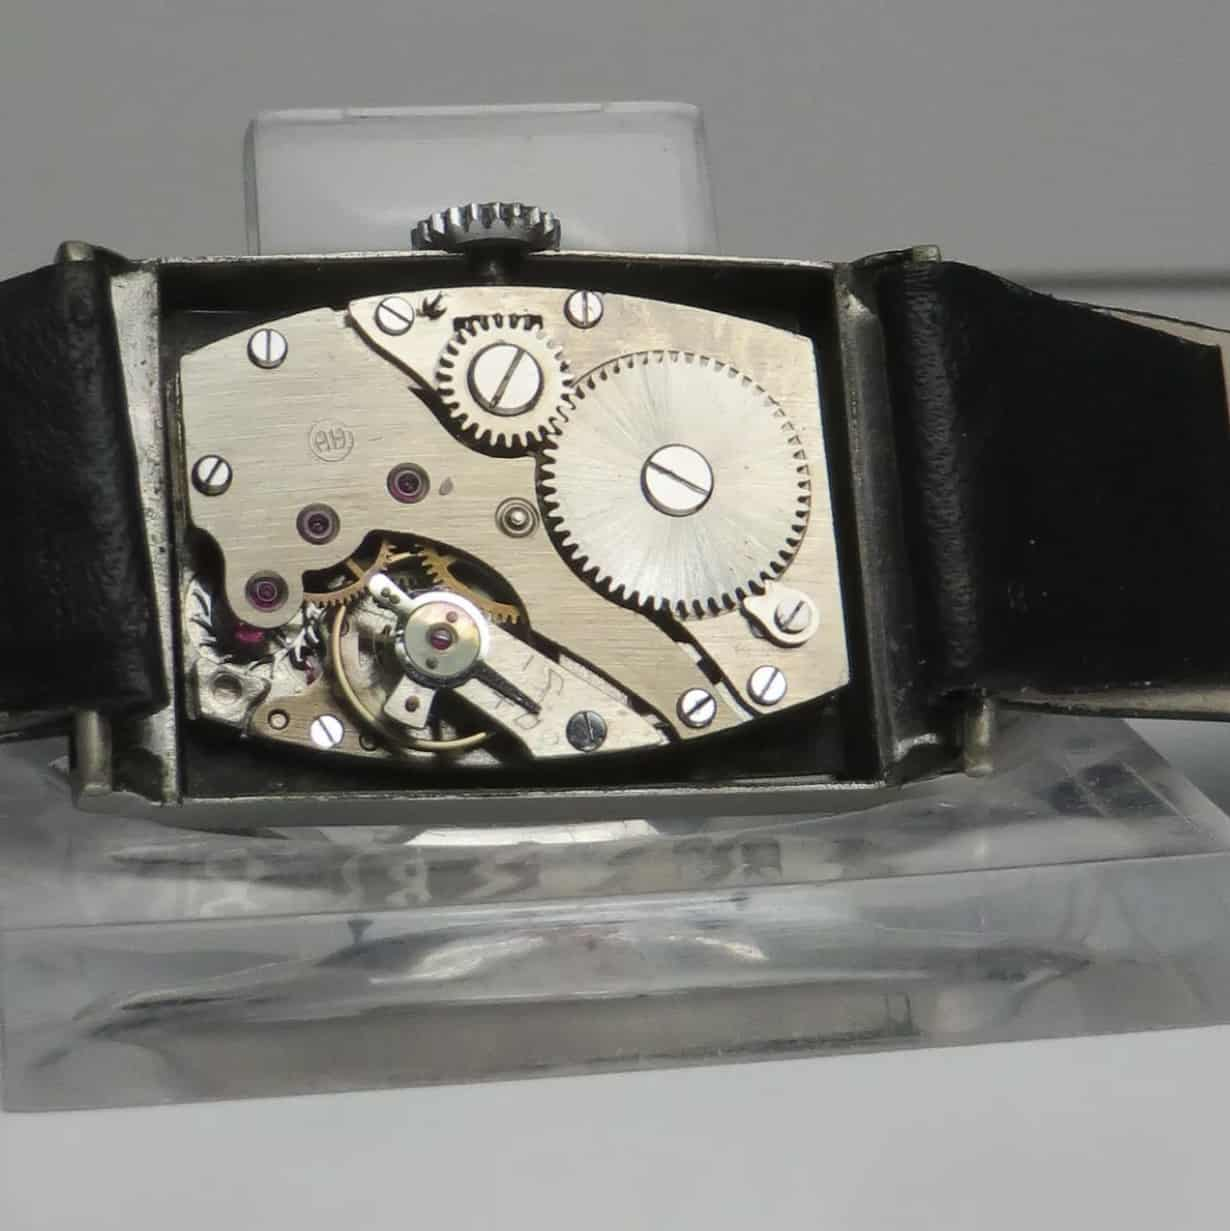 Hanhart-Armbanduhr-rechteckig-1930-er-Jahre-Kaliber-36-(C)-Uhrenkosmos